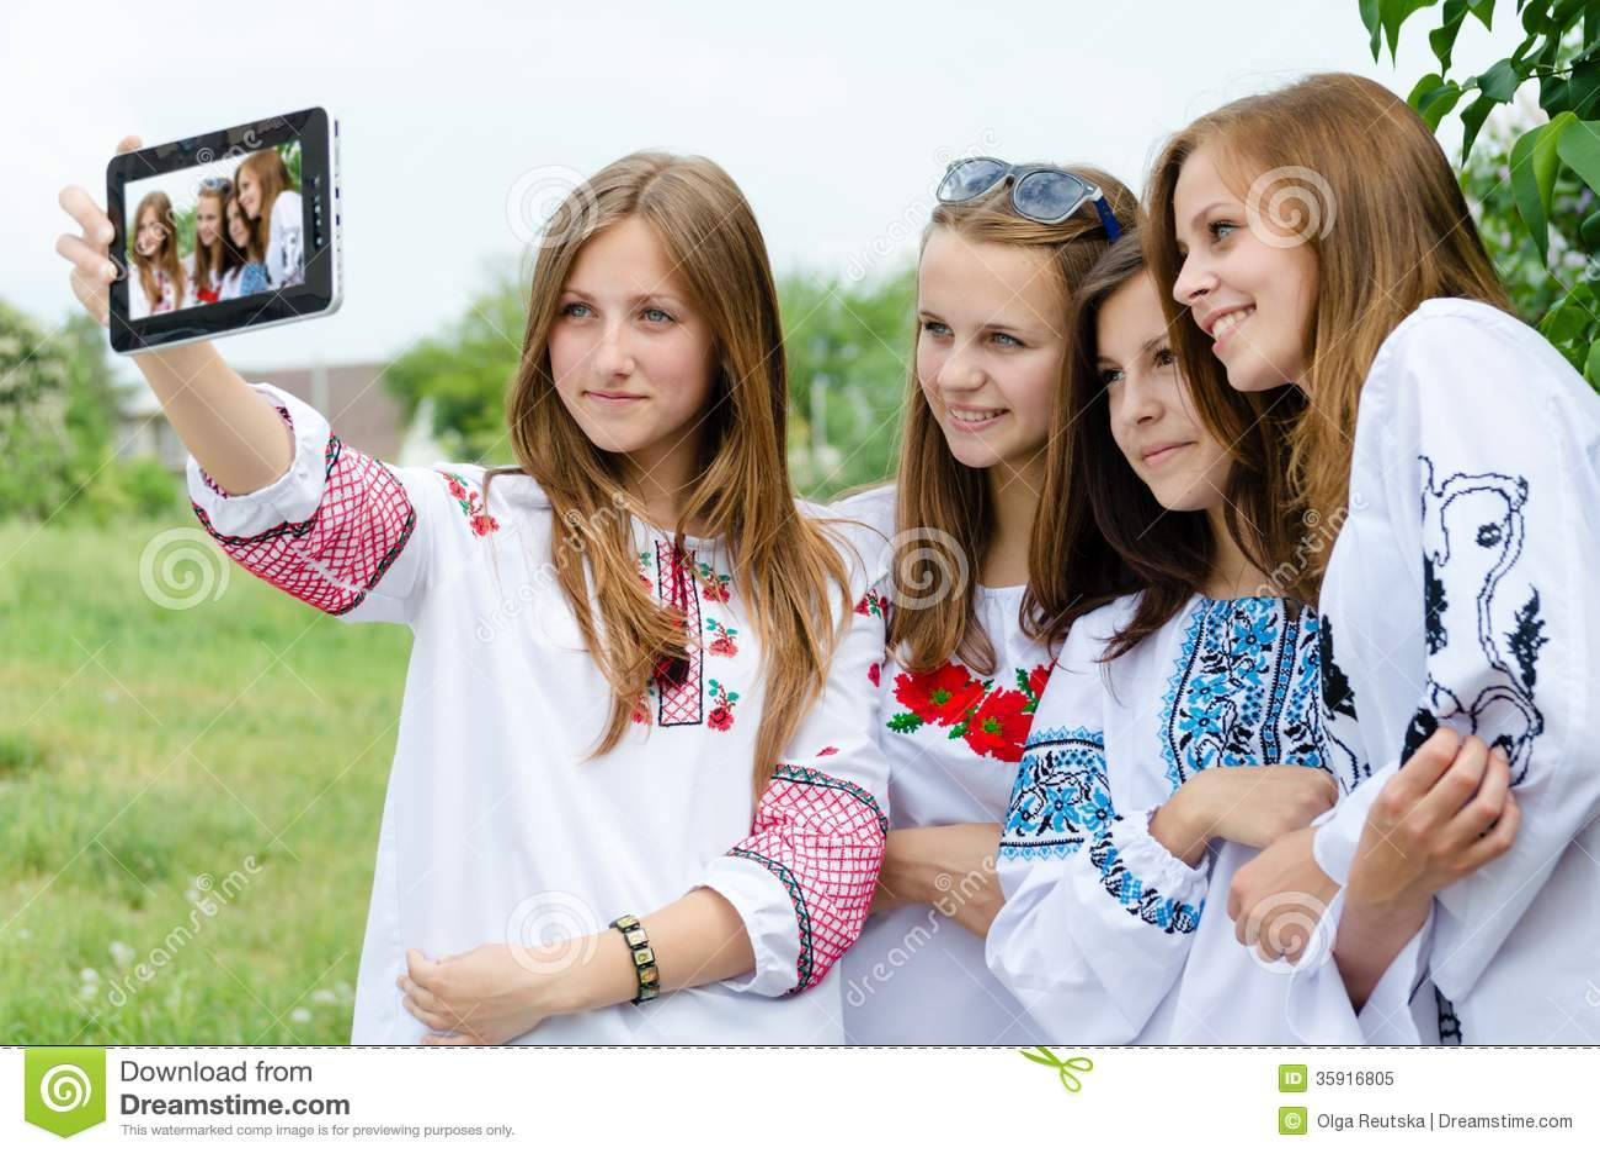 Time Introducing Themselves Ukrainian Women 9